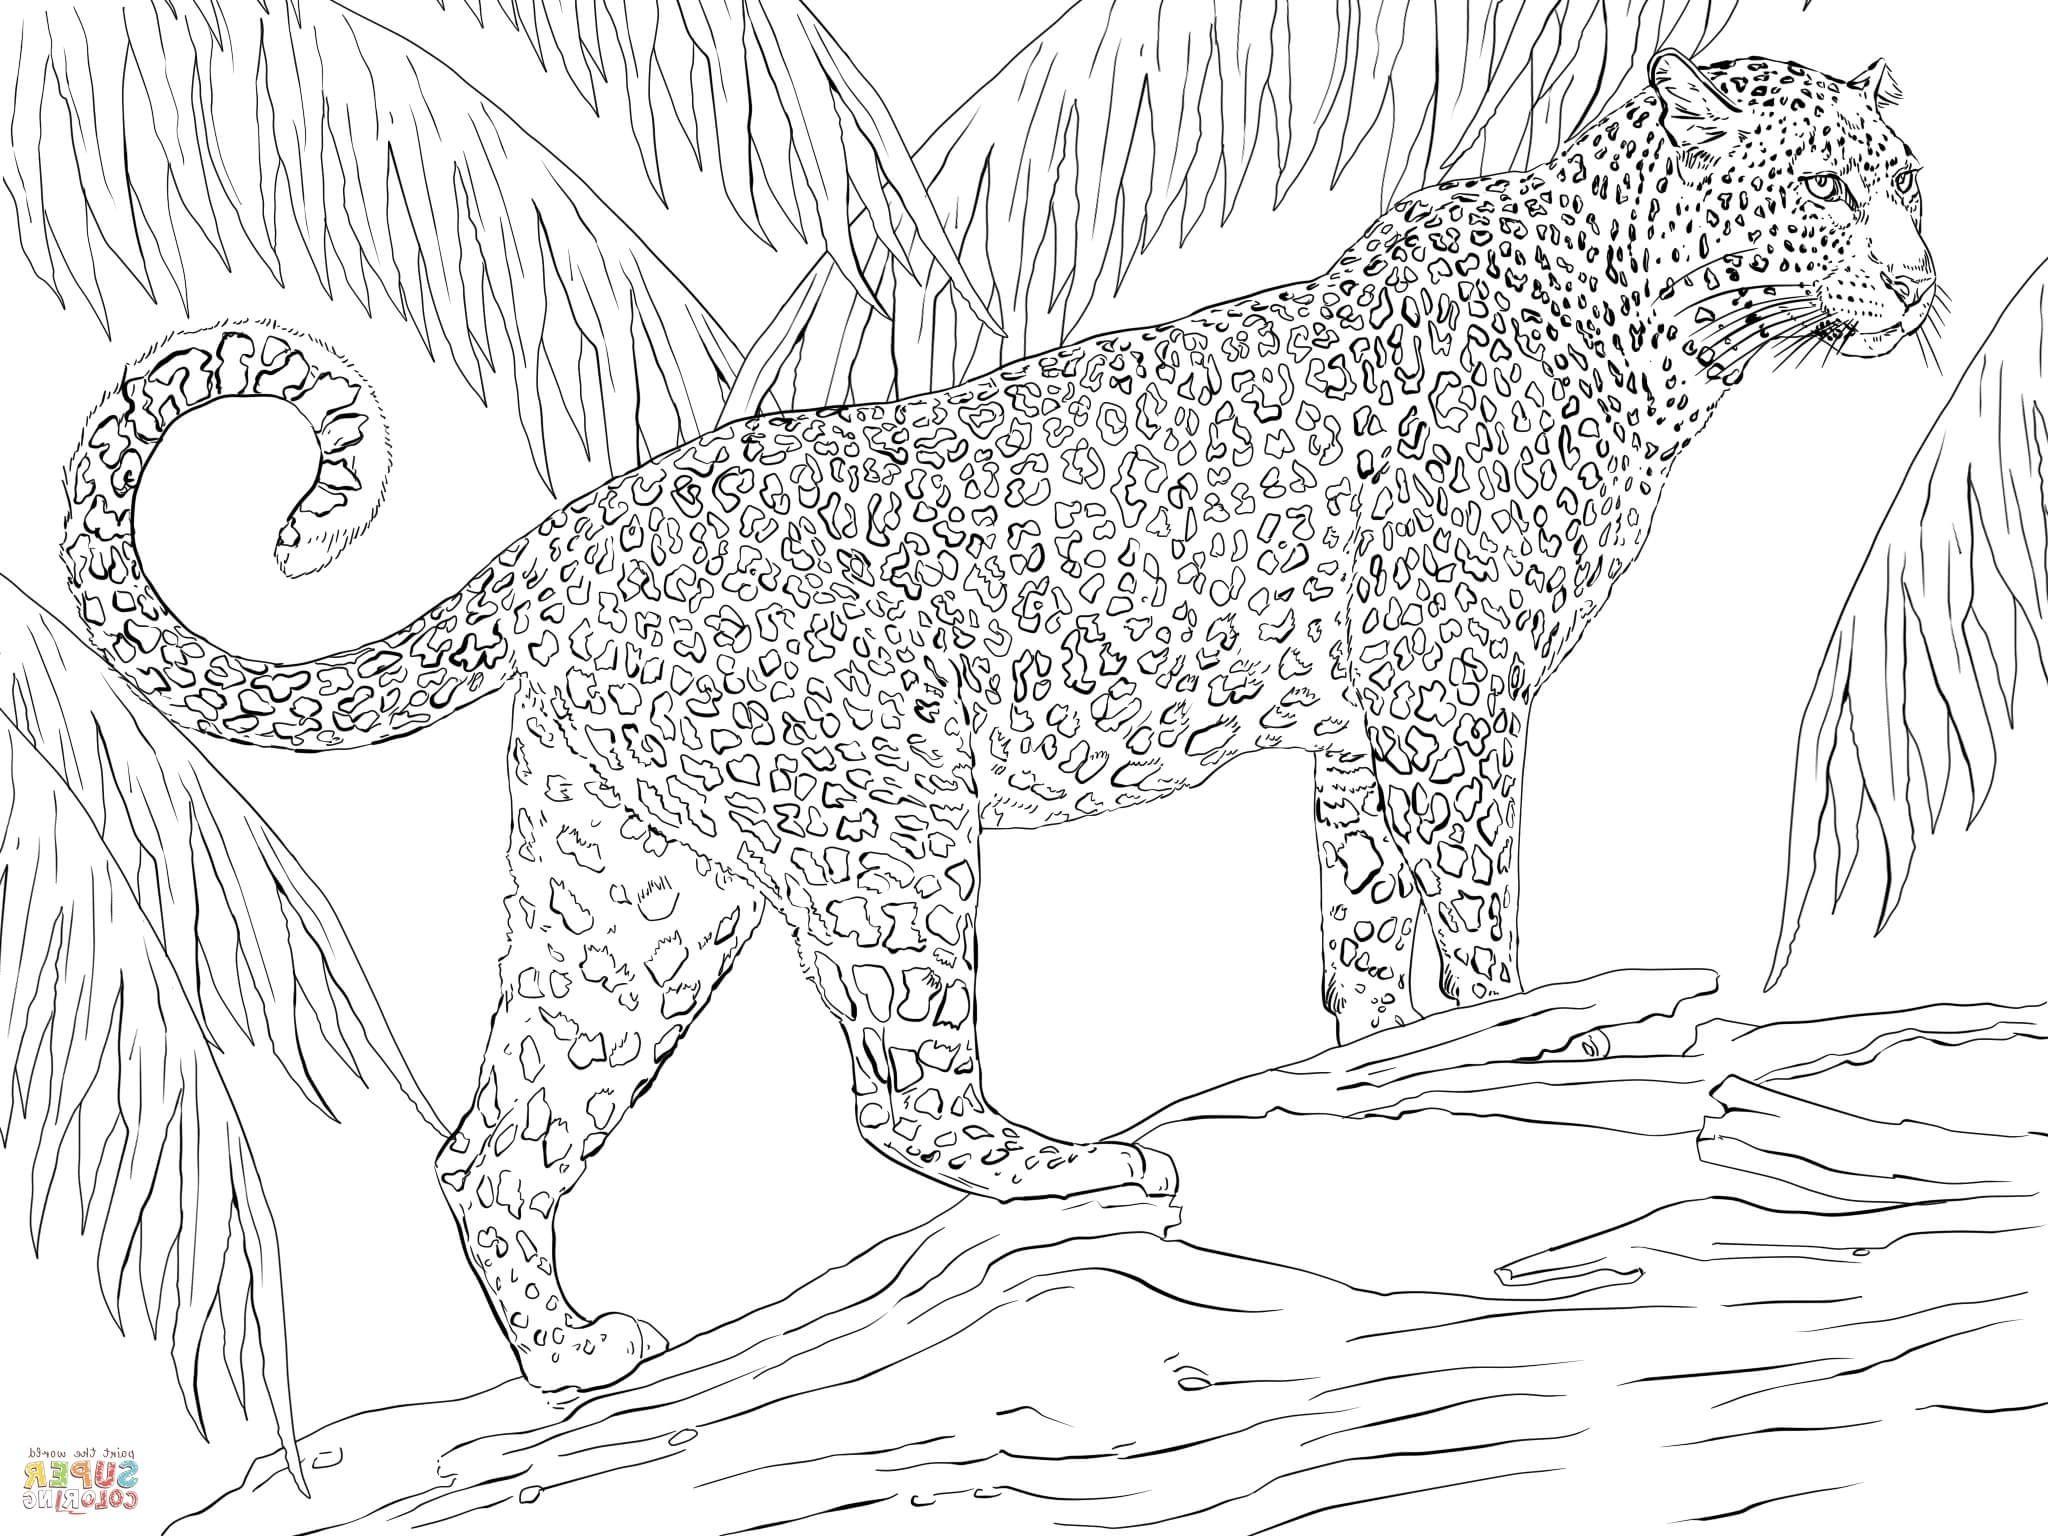 Jaguar Coloring Pages Animal Coloring Pages Coloring Pages Jaguar Animal